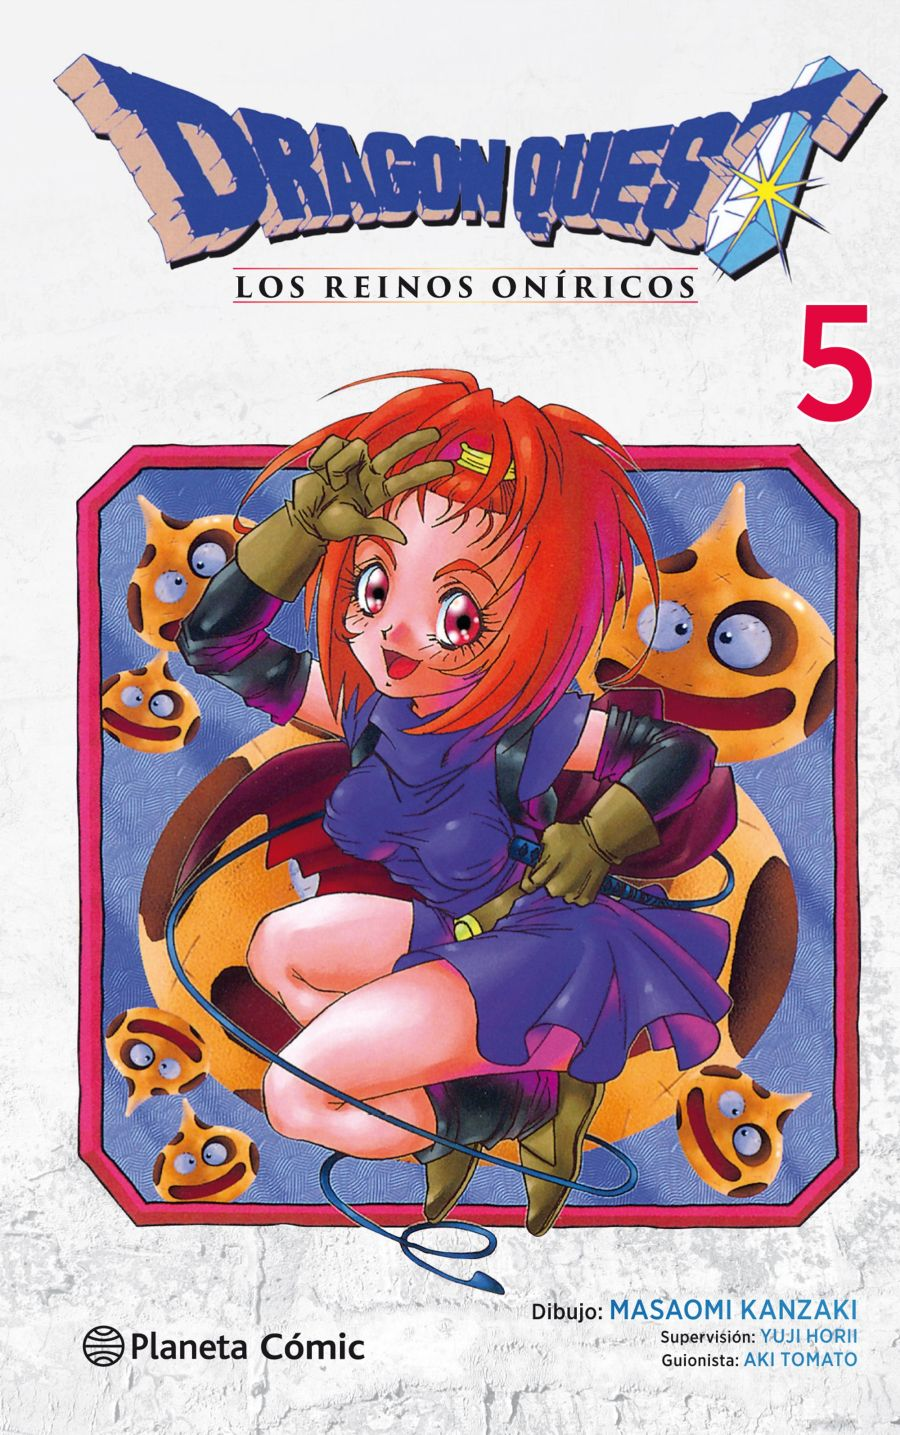 dq los reinos oniricos 5